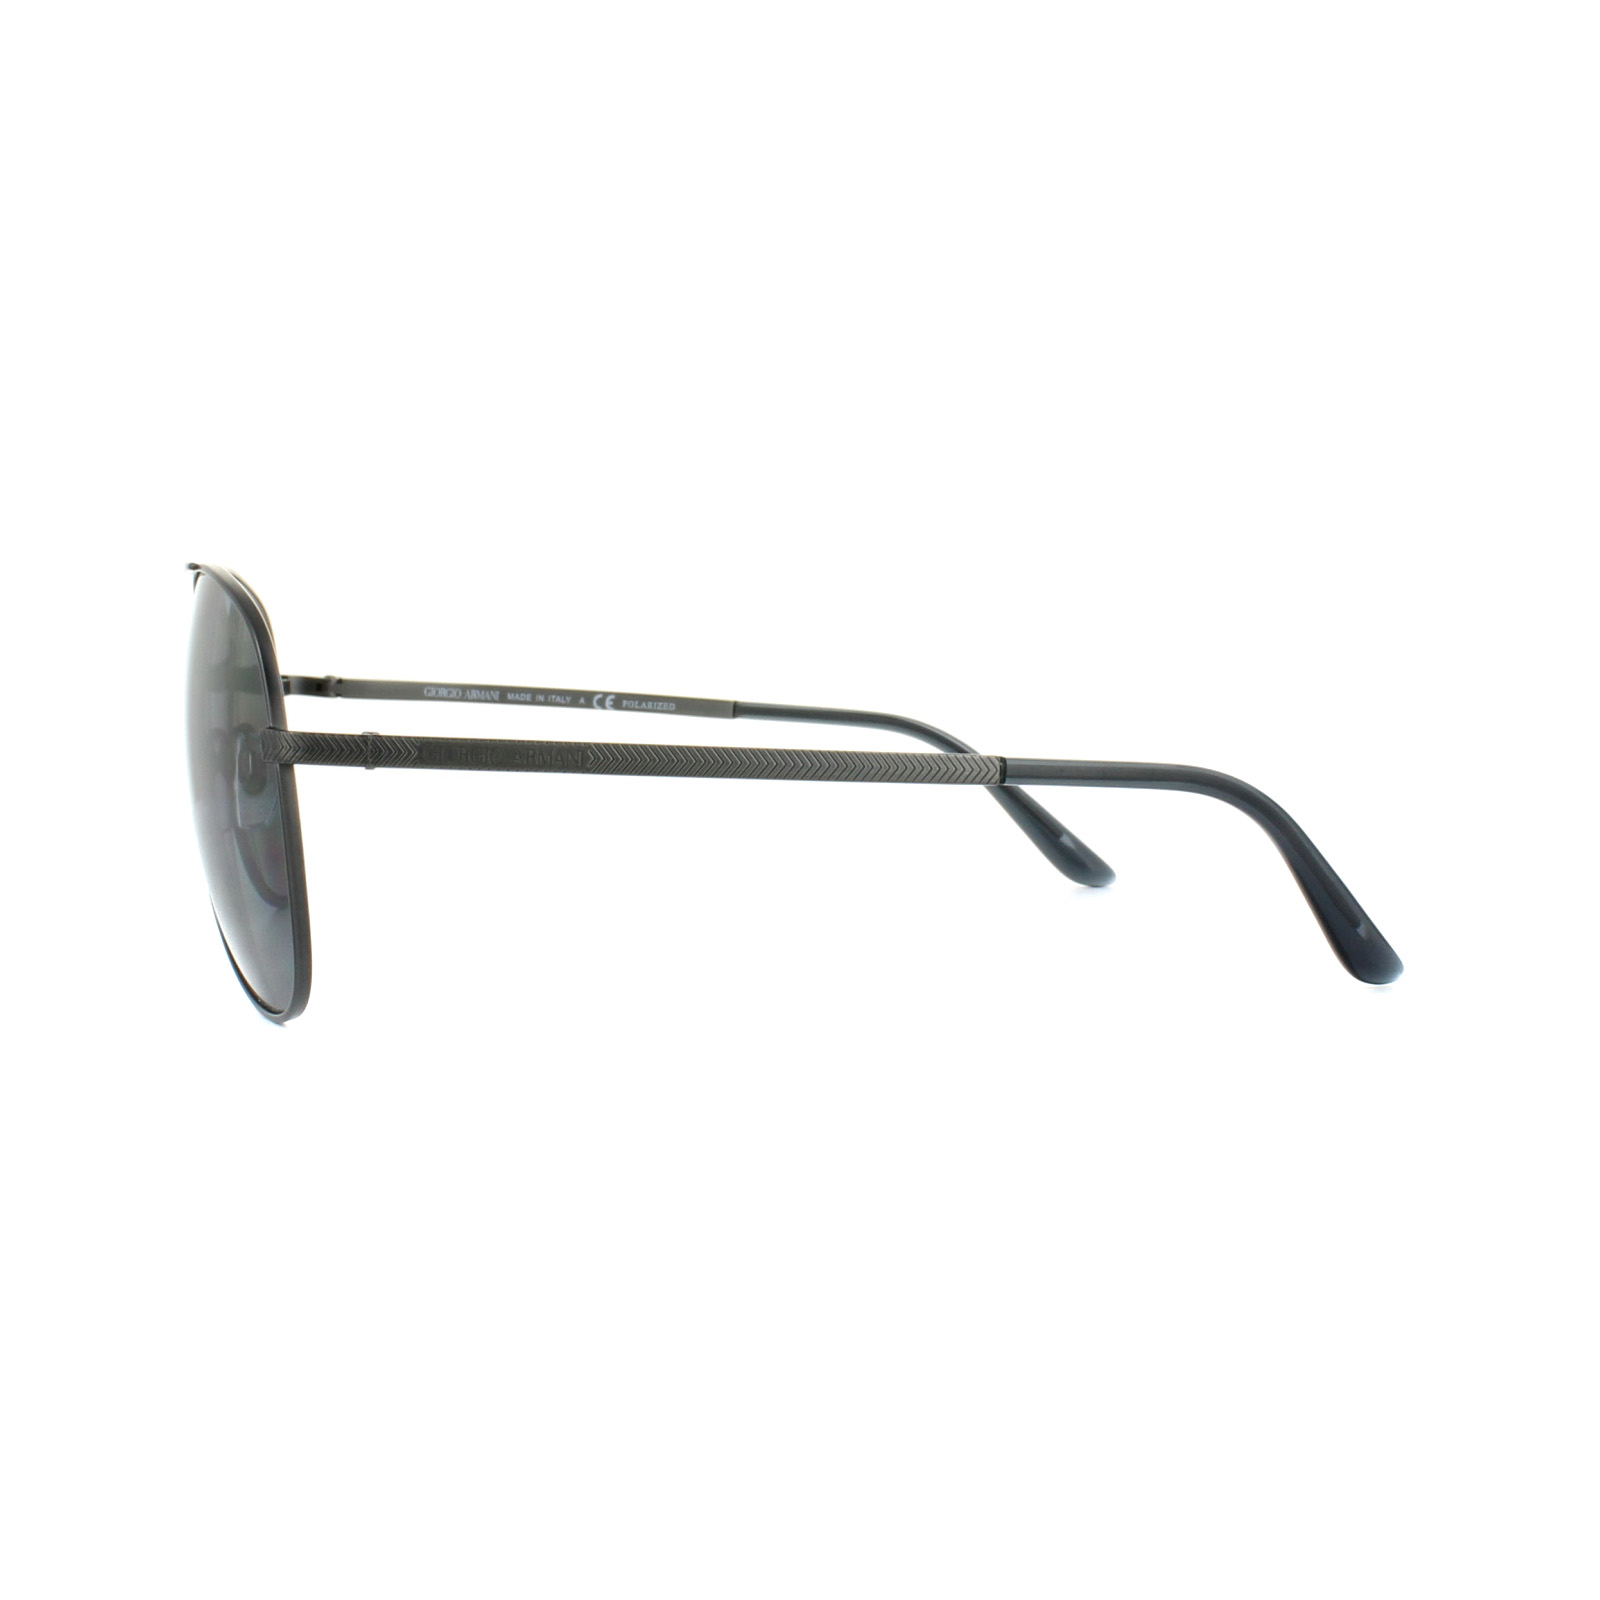 dc90d3643496 Sentinel Thumbnail 3. Sentinel Giorgio Armani Sunglasses AR6030 312181 Matt  Grey Grey Polarized